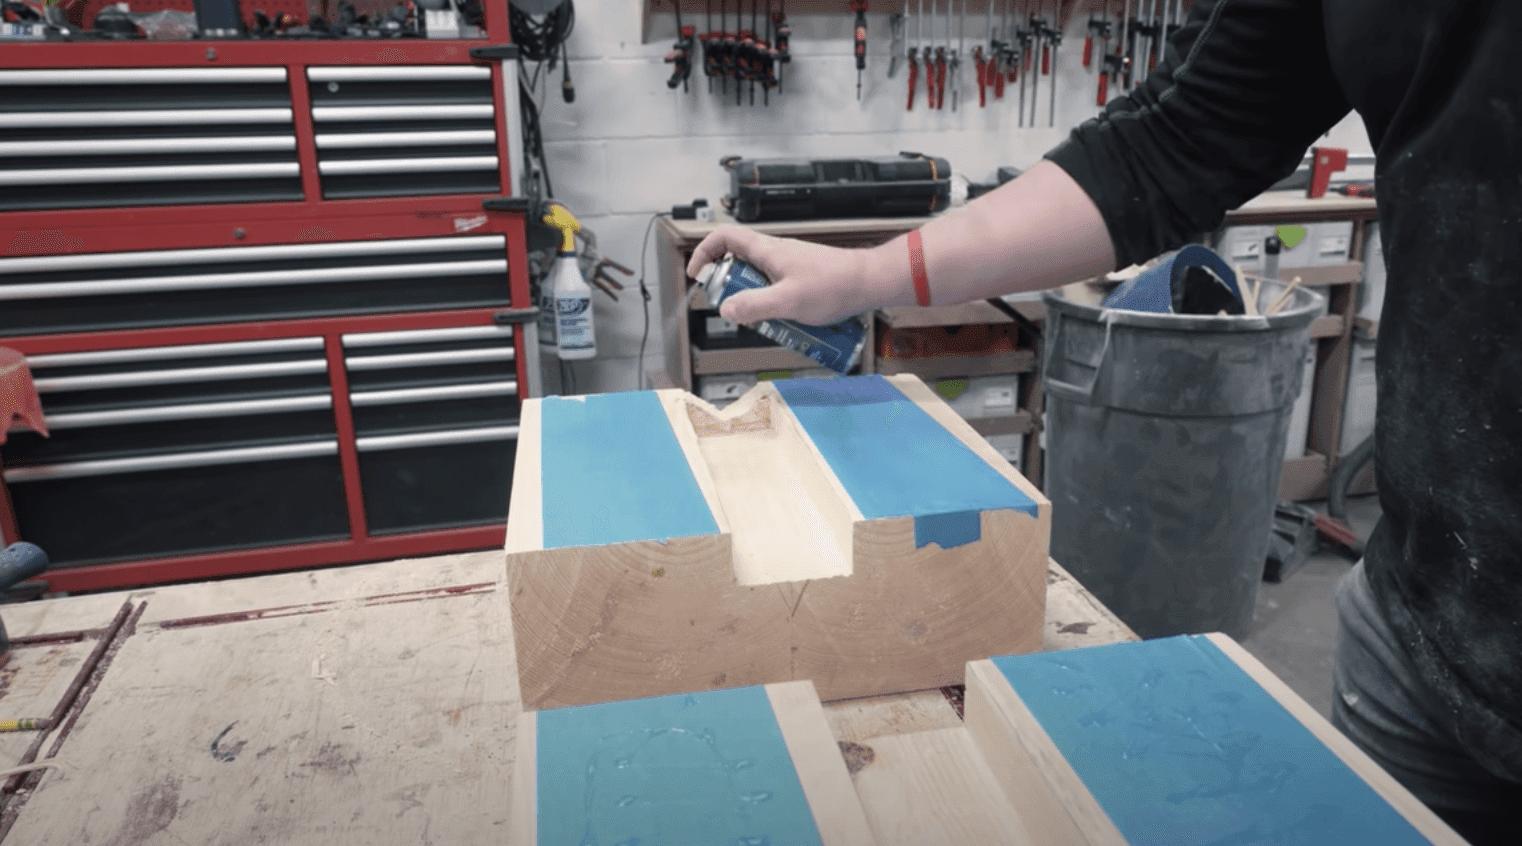 spraying activator on wooden blocks